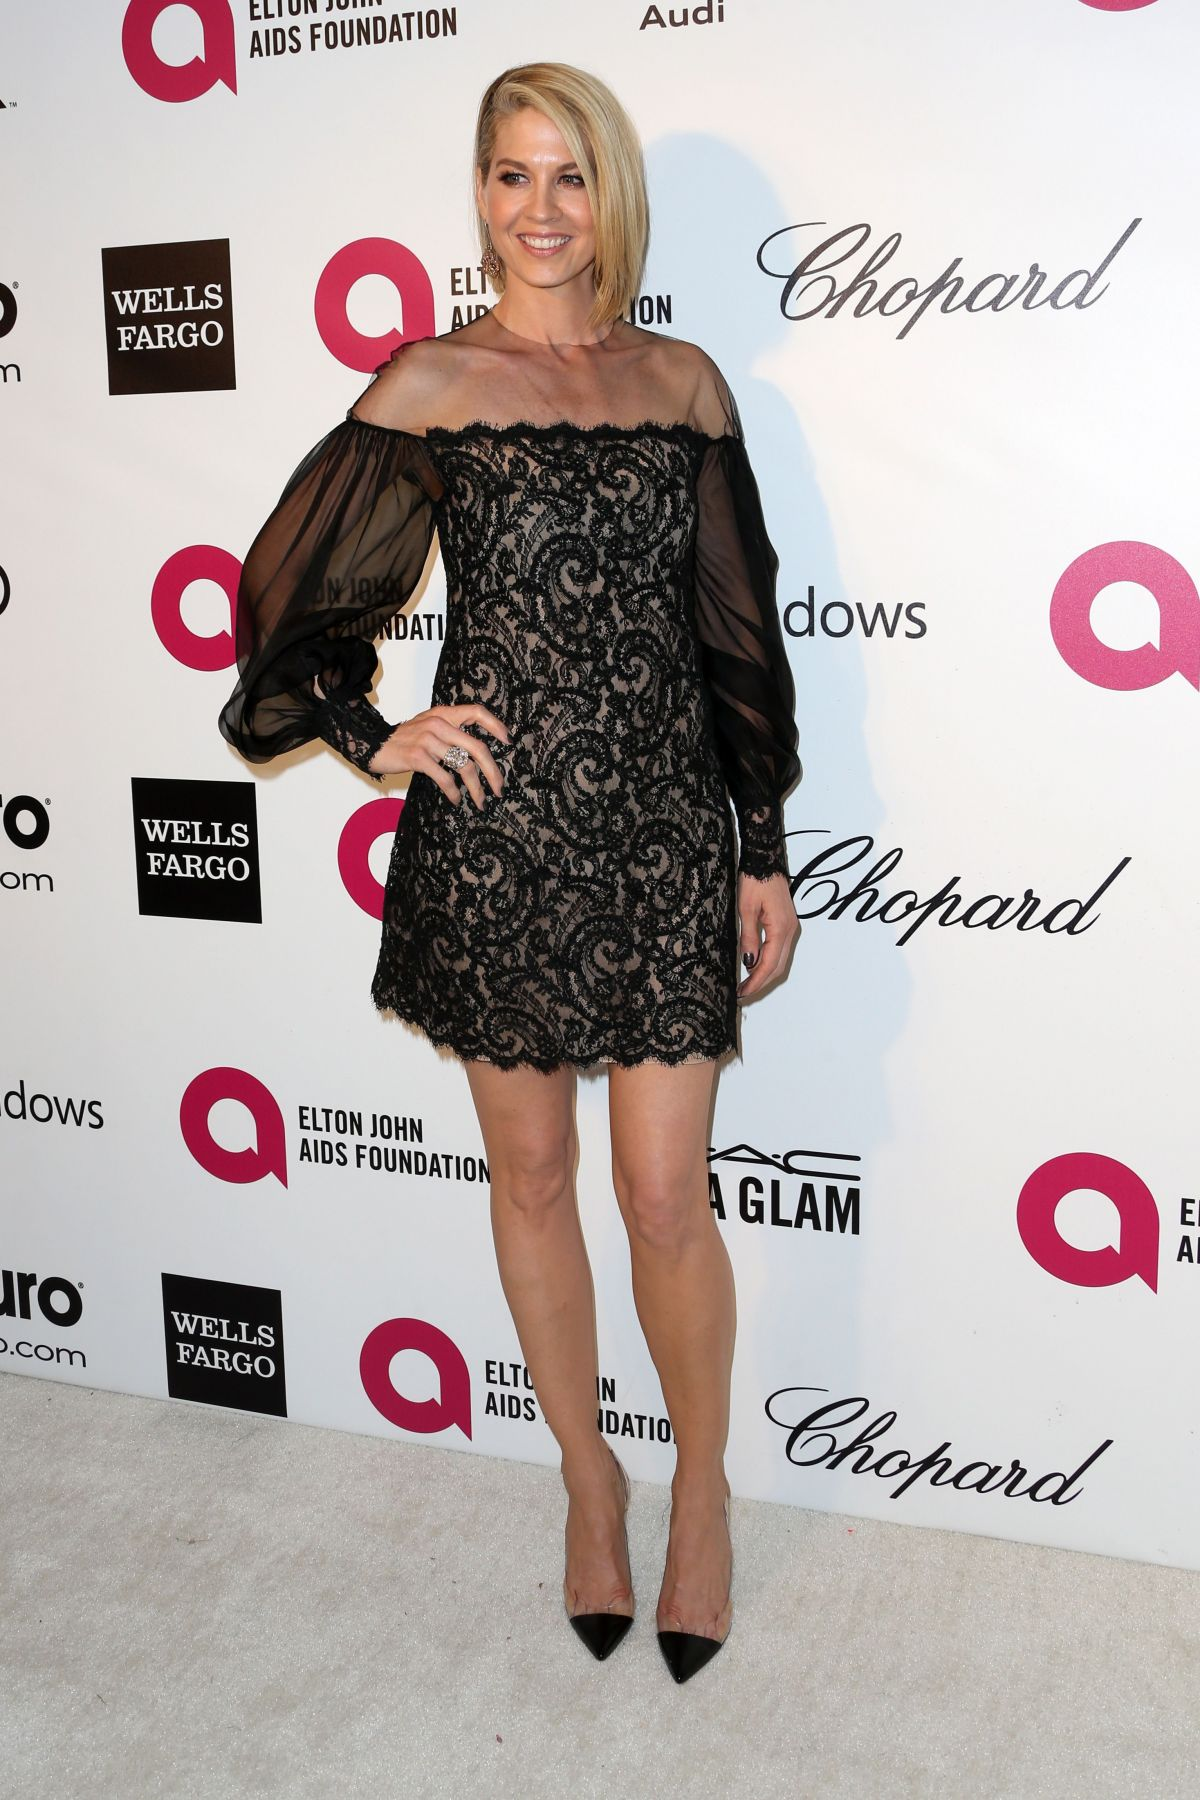 JENNA ELFMAN at Elton John Aids Foundation Oscar Party in Los Angeles